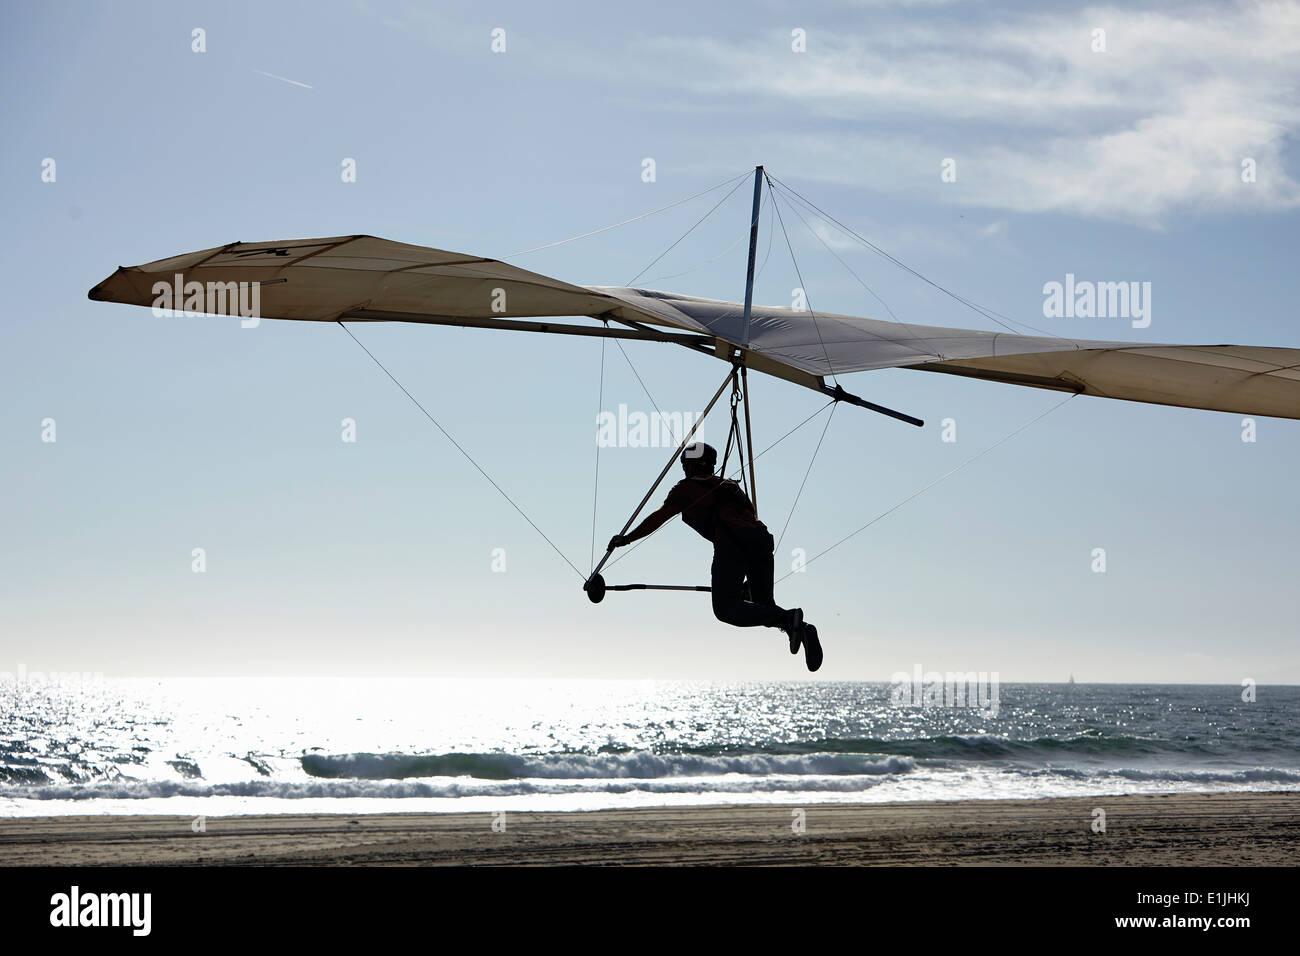 Hang glider pilot landing on beach - Stock Image